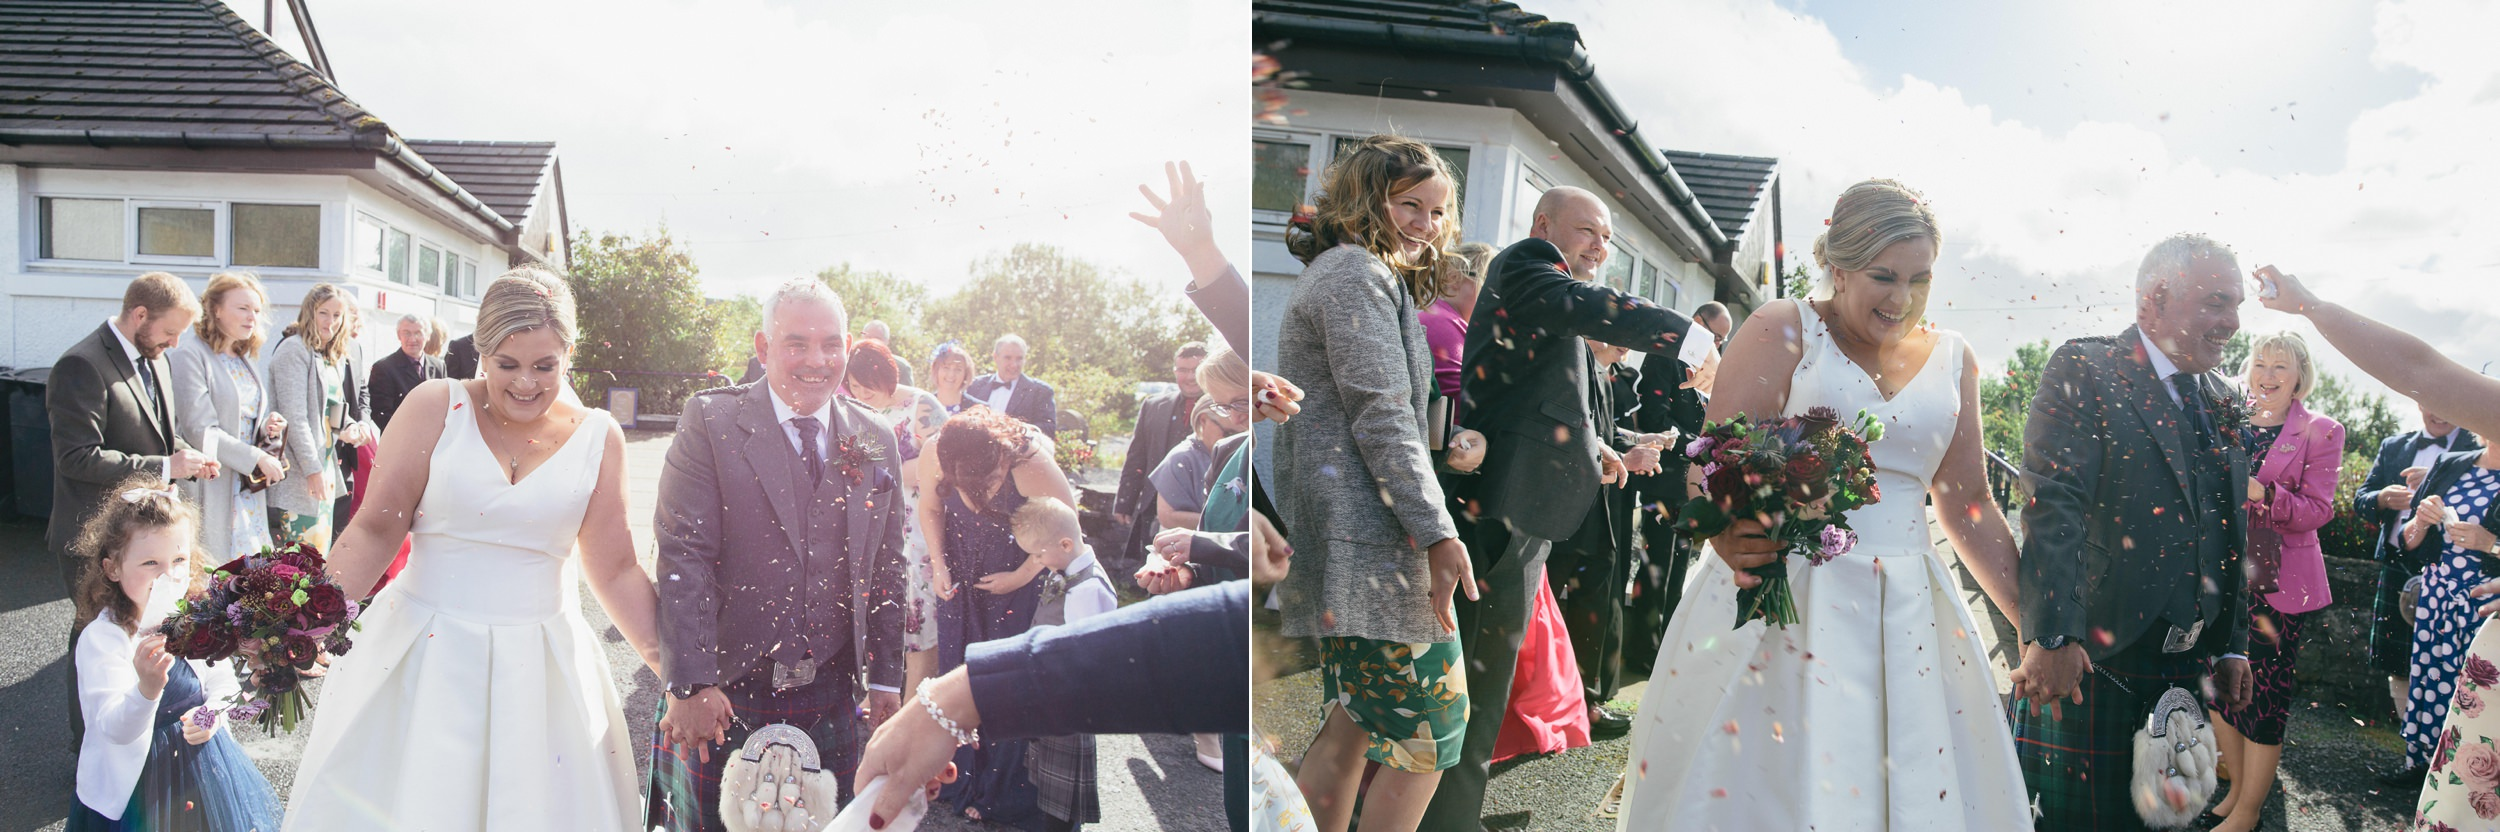 Quirky Wedding Photographer Scotland Glasgow Edinburgh Mirrorbox 080.jpg